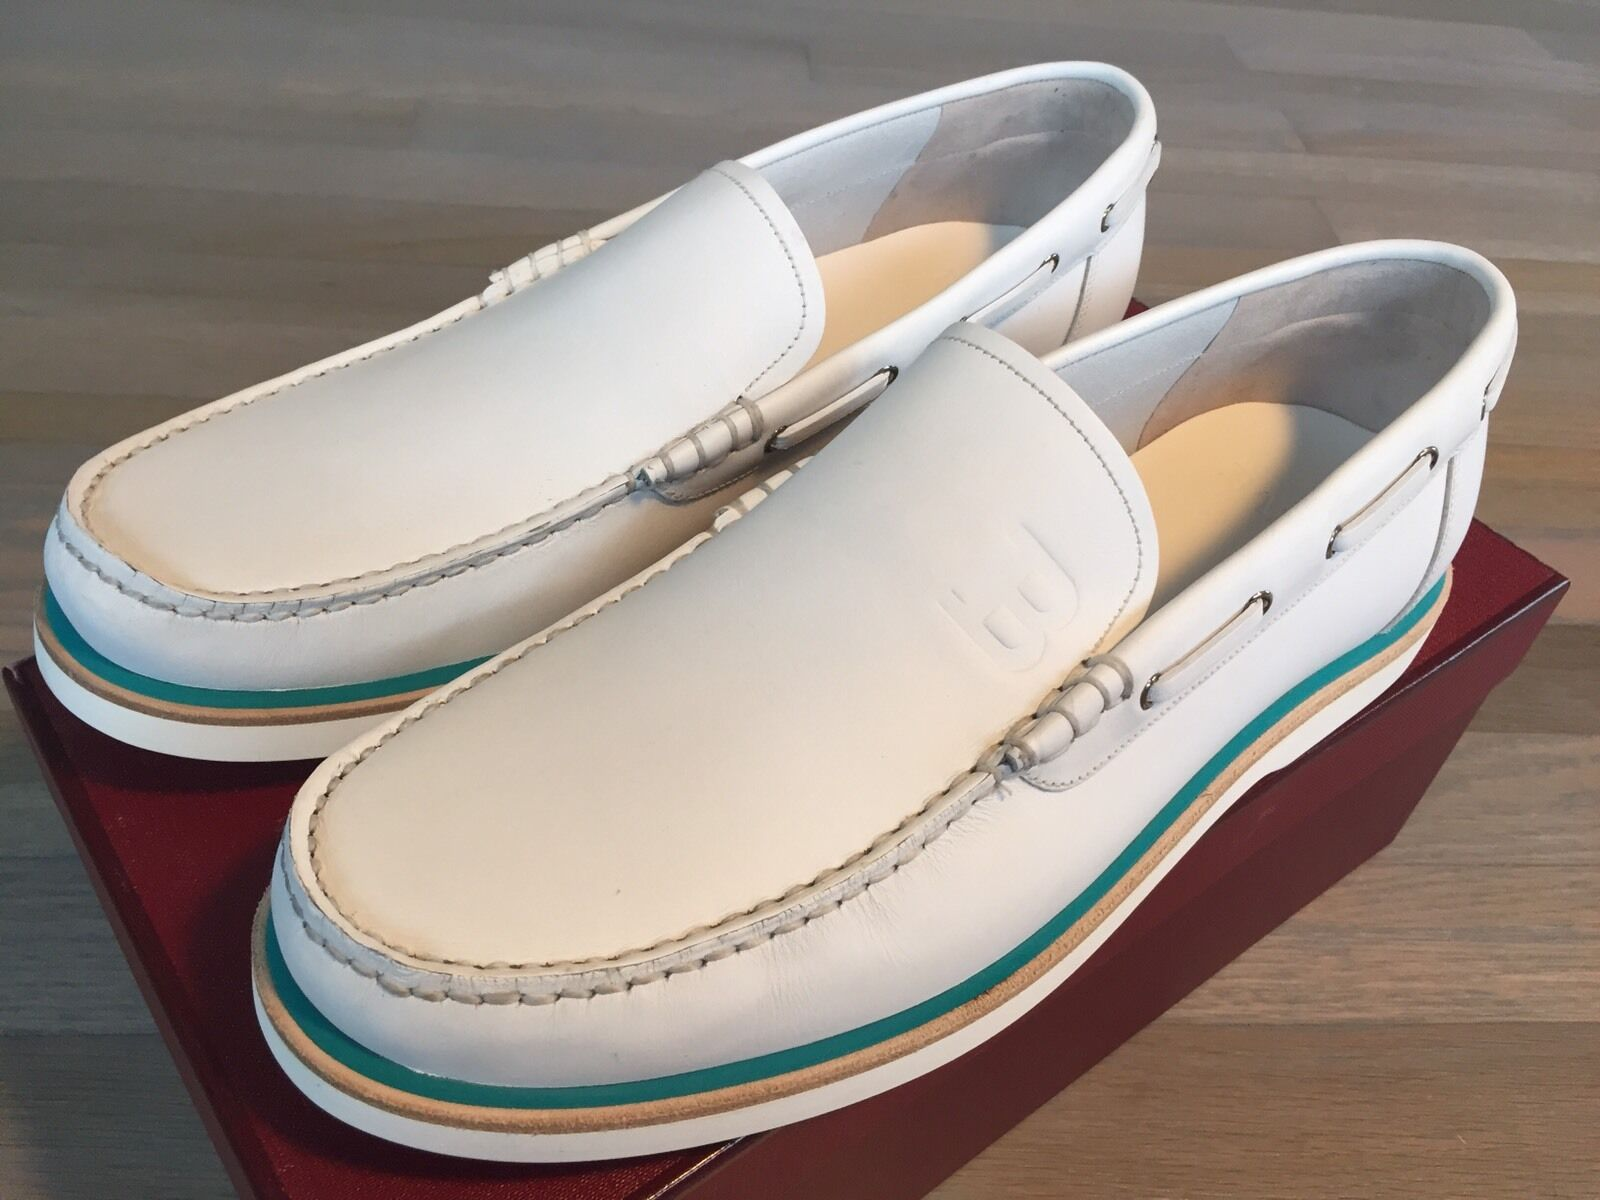 Scarpe casual da uomo  600$ Bally Leather White Boat Shoes size US 13 Made in Switzerland